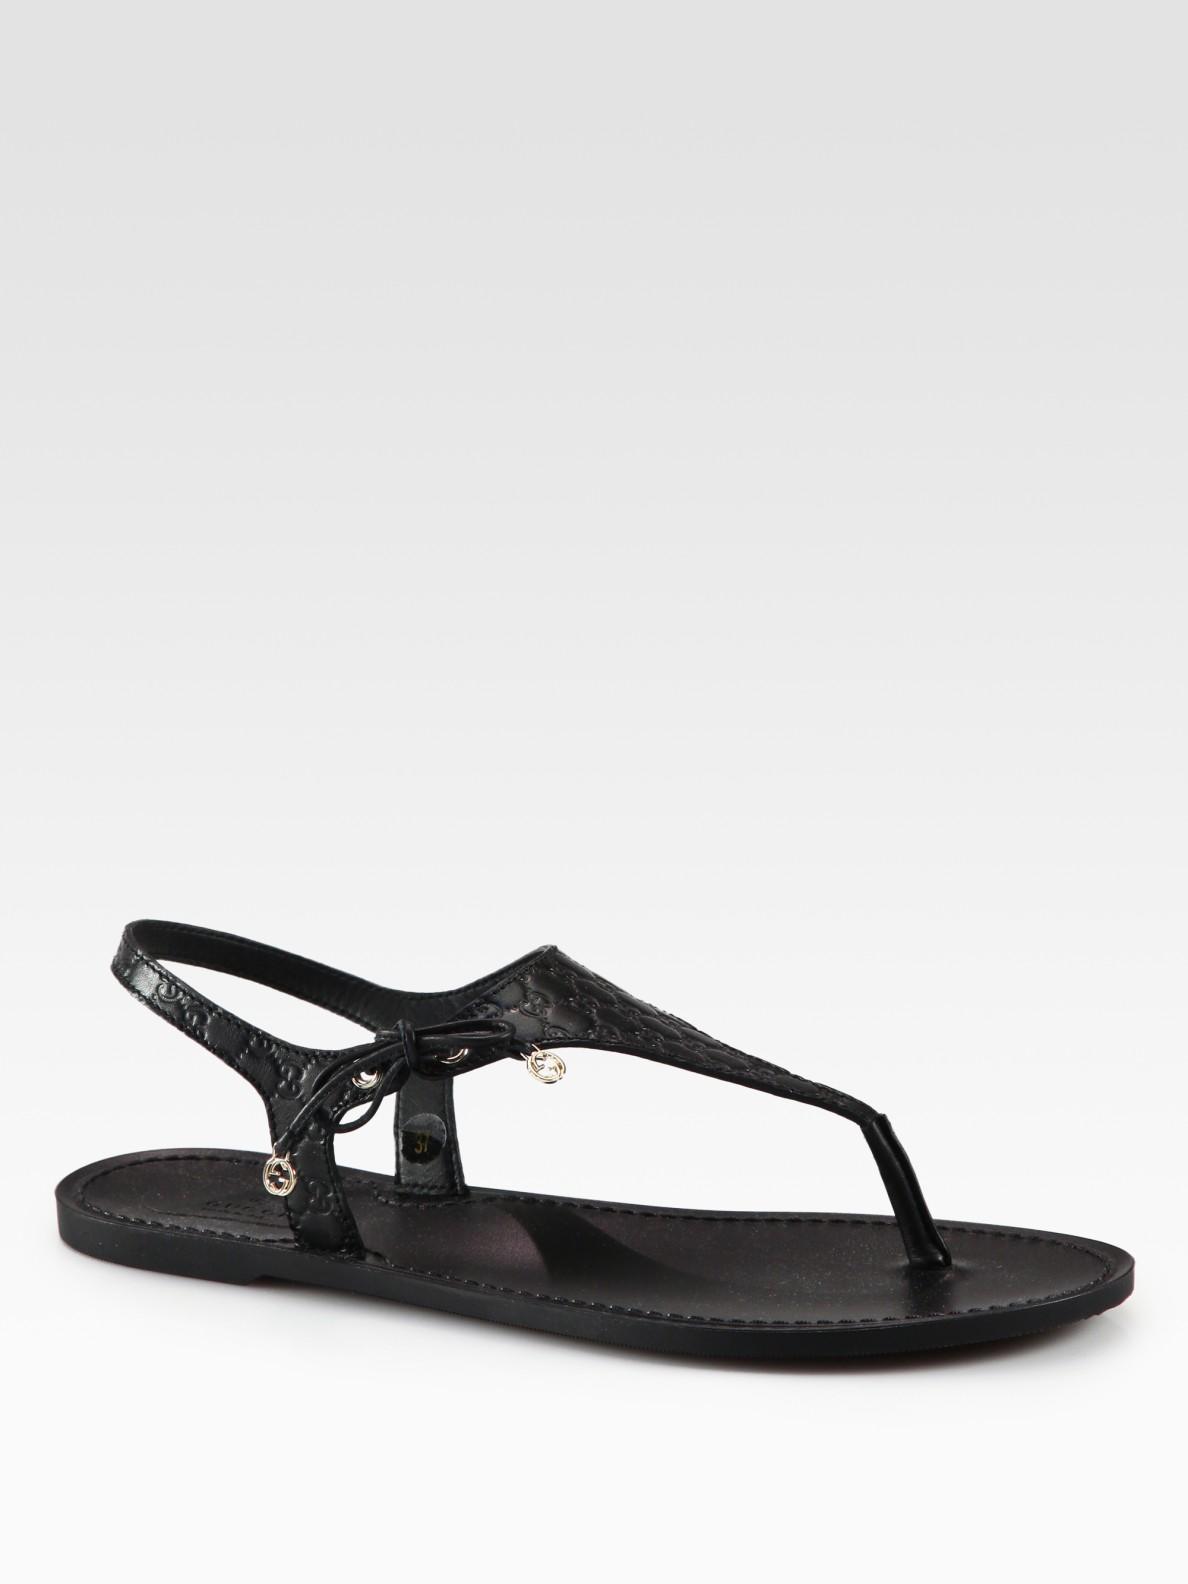 8da08aca7609 Lyst - Gucci Katina Leather Thong Sandals in Black